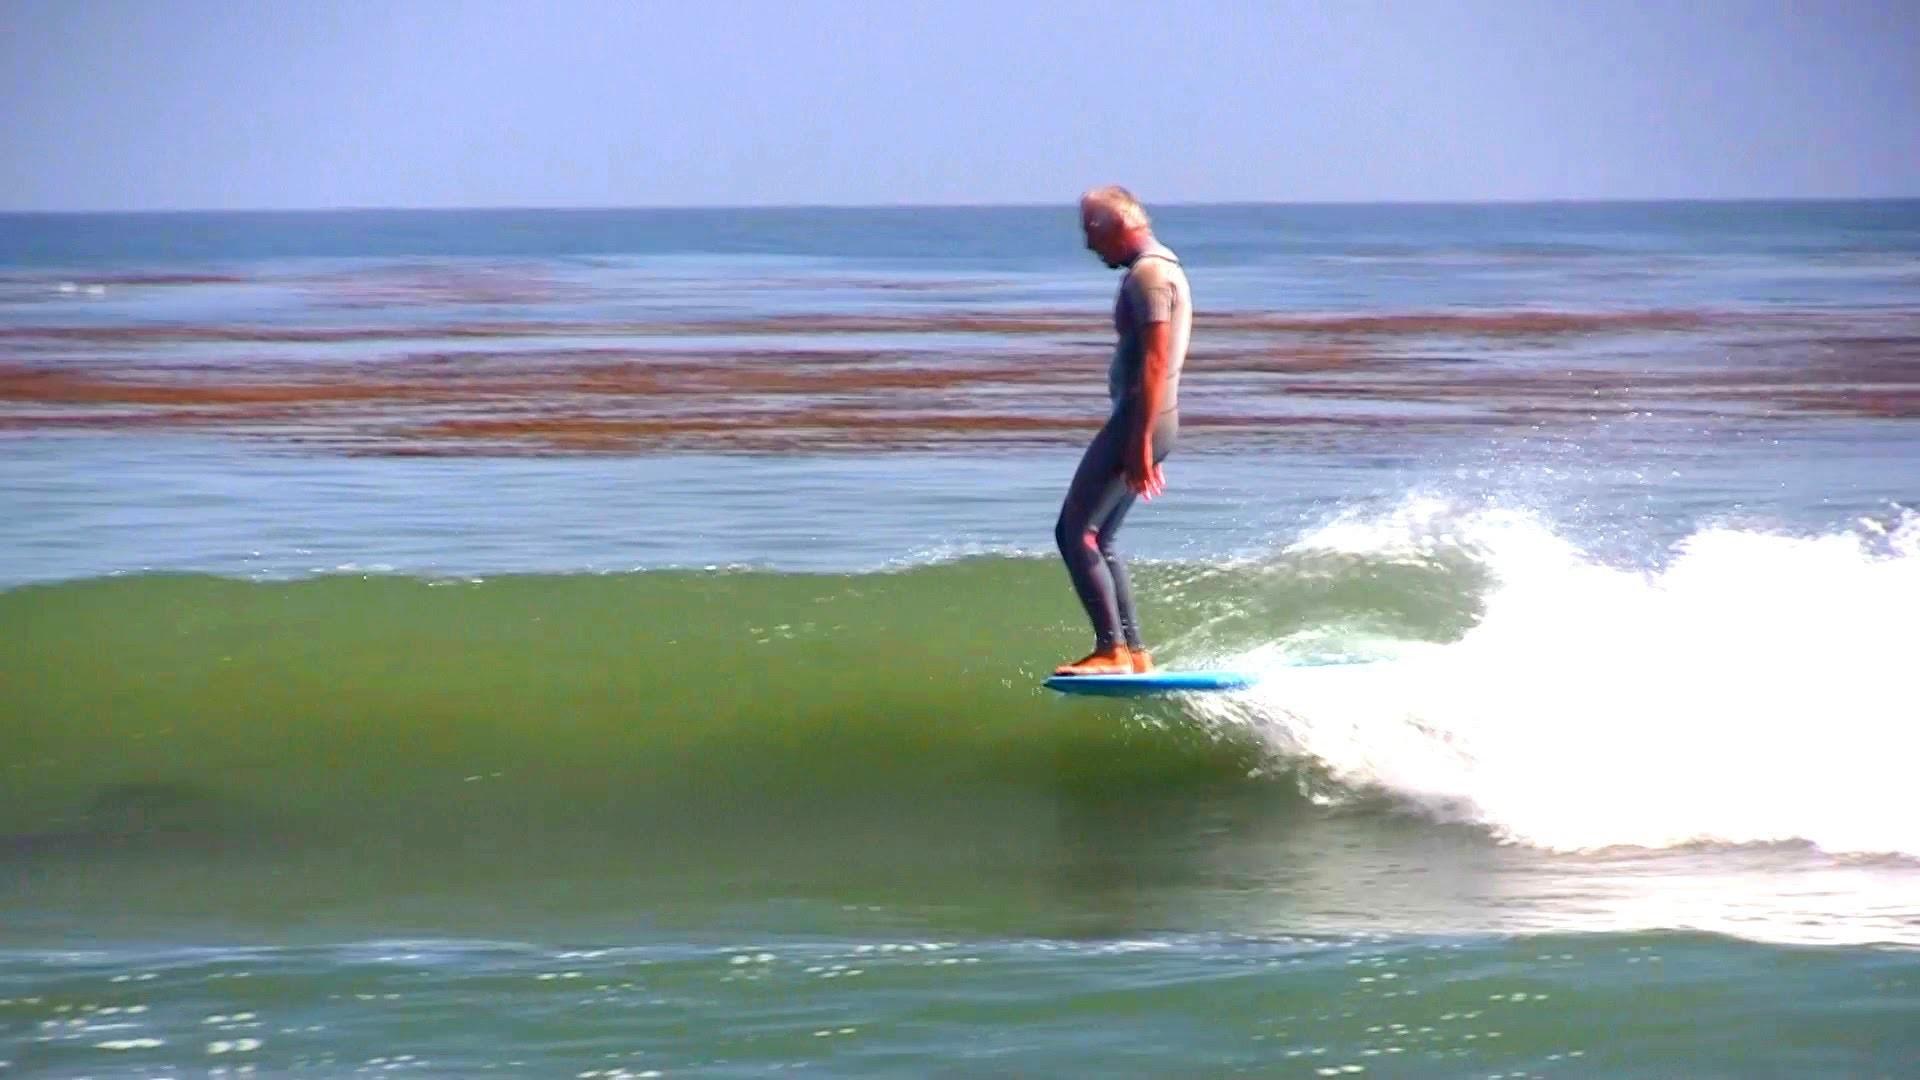 Hd Girl Highlights Wallpaper Surfing Longboard Wallpaper 66 Images